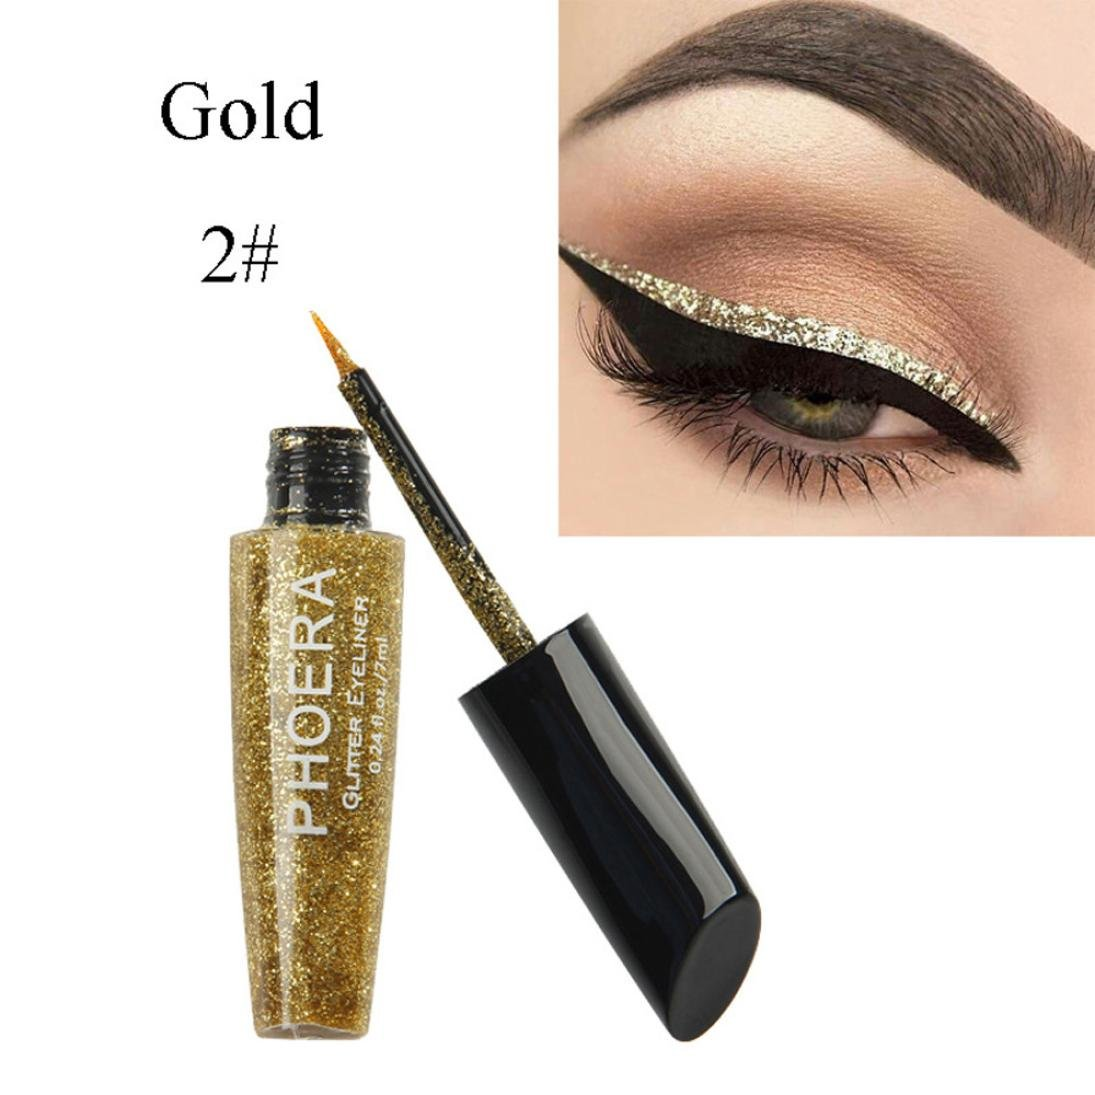 HP95(TM) Available Choose-10 Color Waterproof Glitter Liquid Eyeliner Metallic Shiny Eyeshadow (Gold)